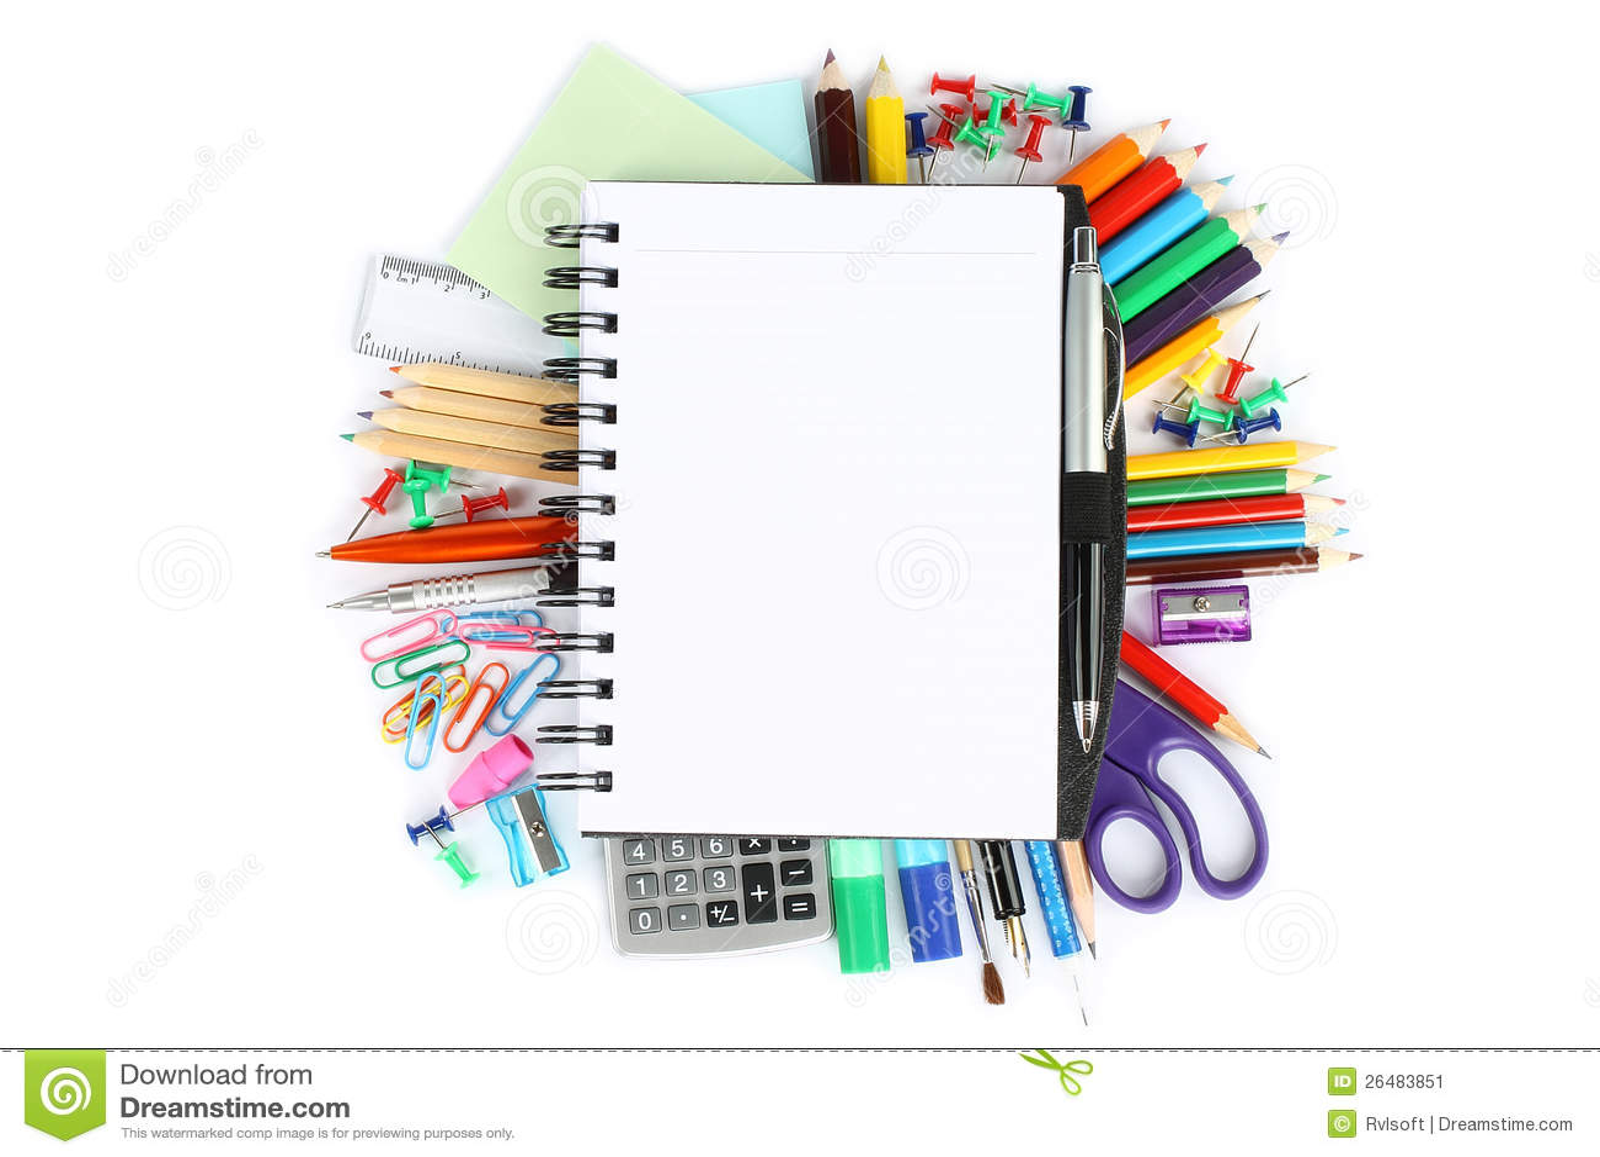 Stationery Items Stock Image Image 26483851